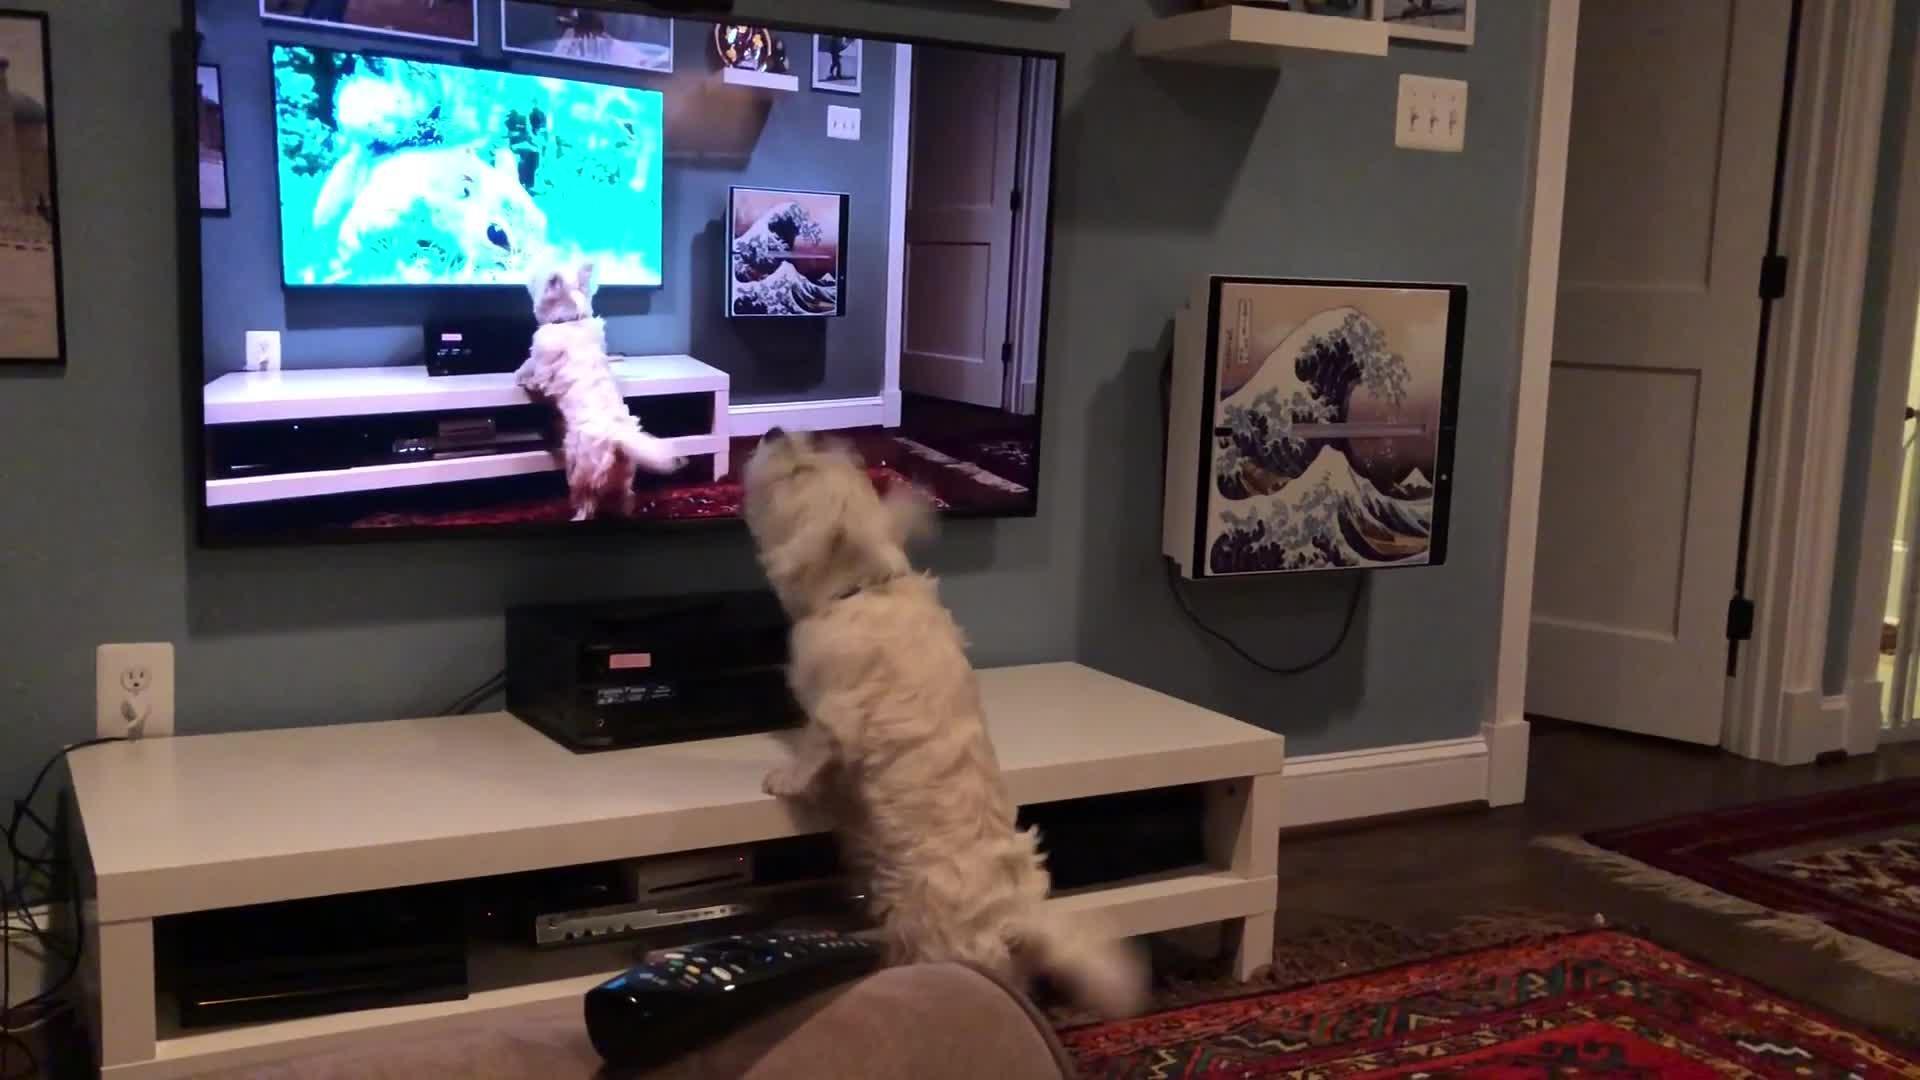 Dog Barks Seeing A Video Of Herself Barking On Tv Jukin Media Inc